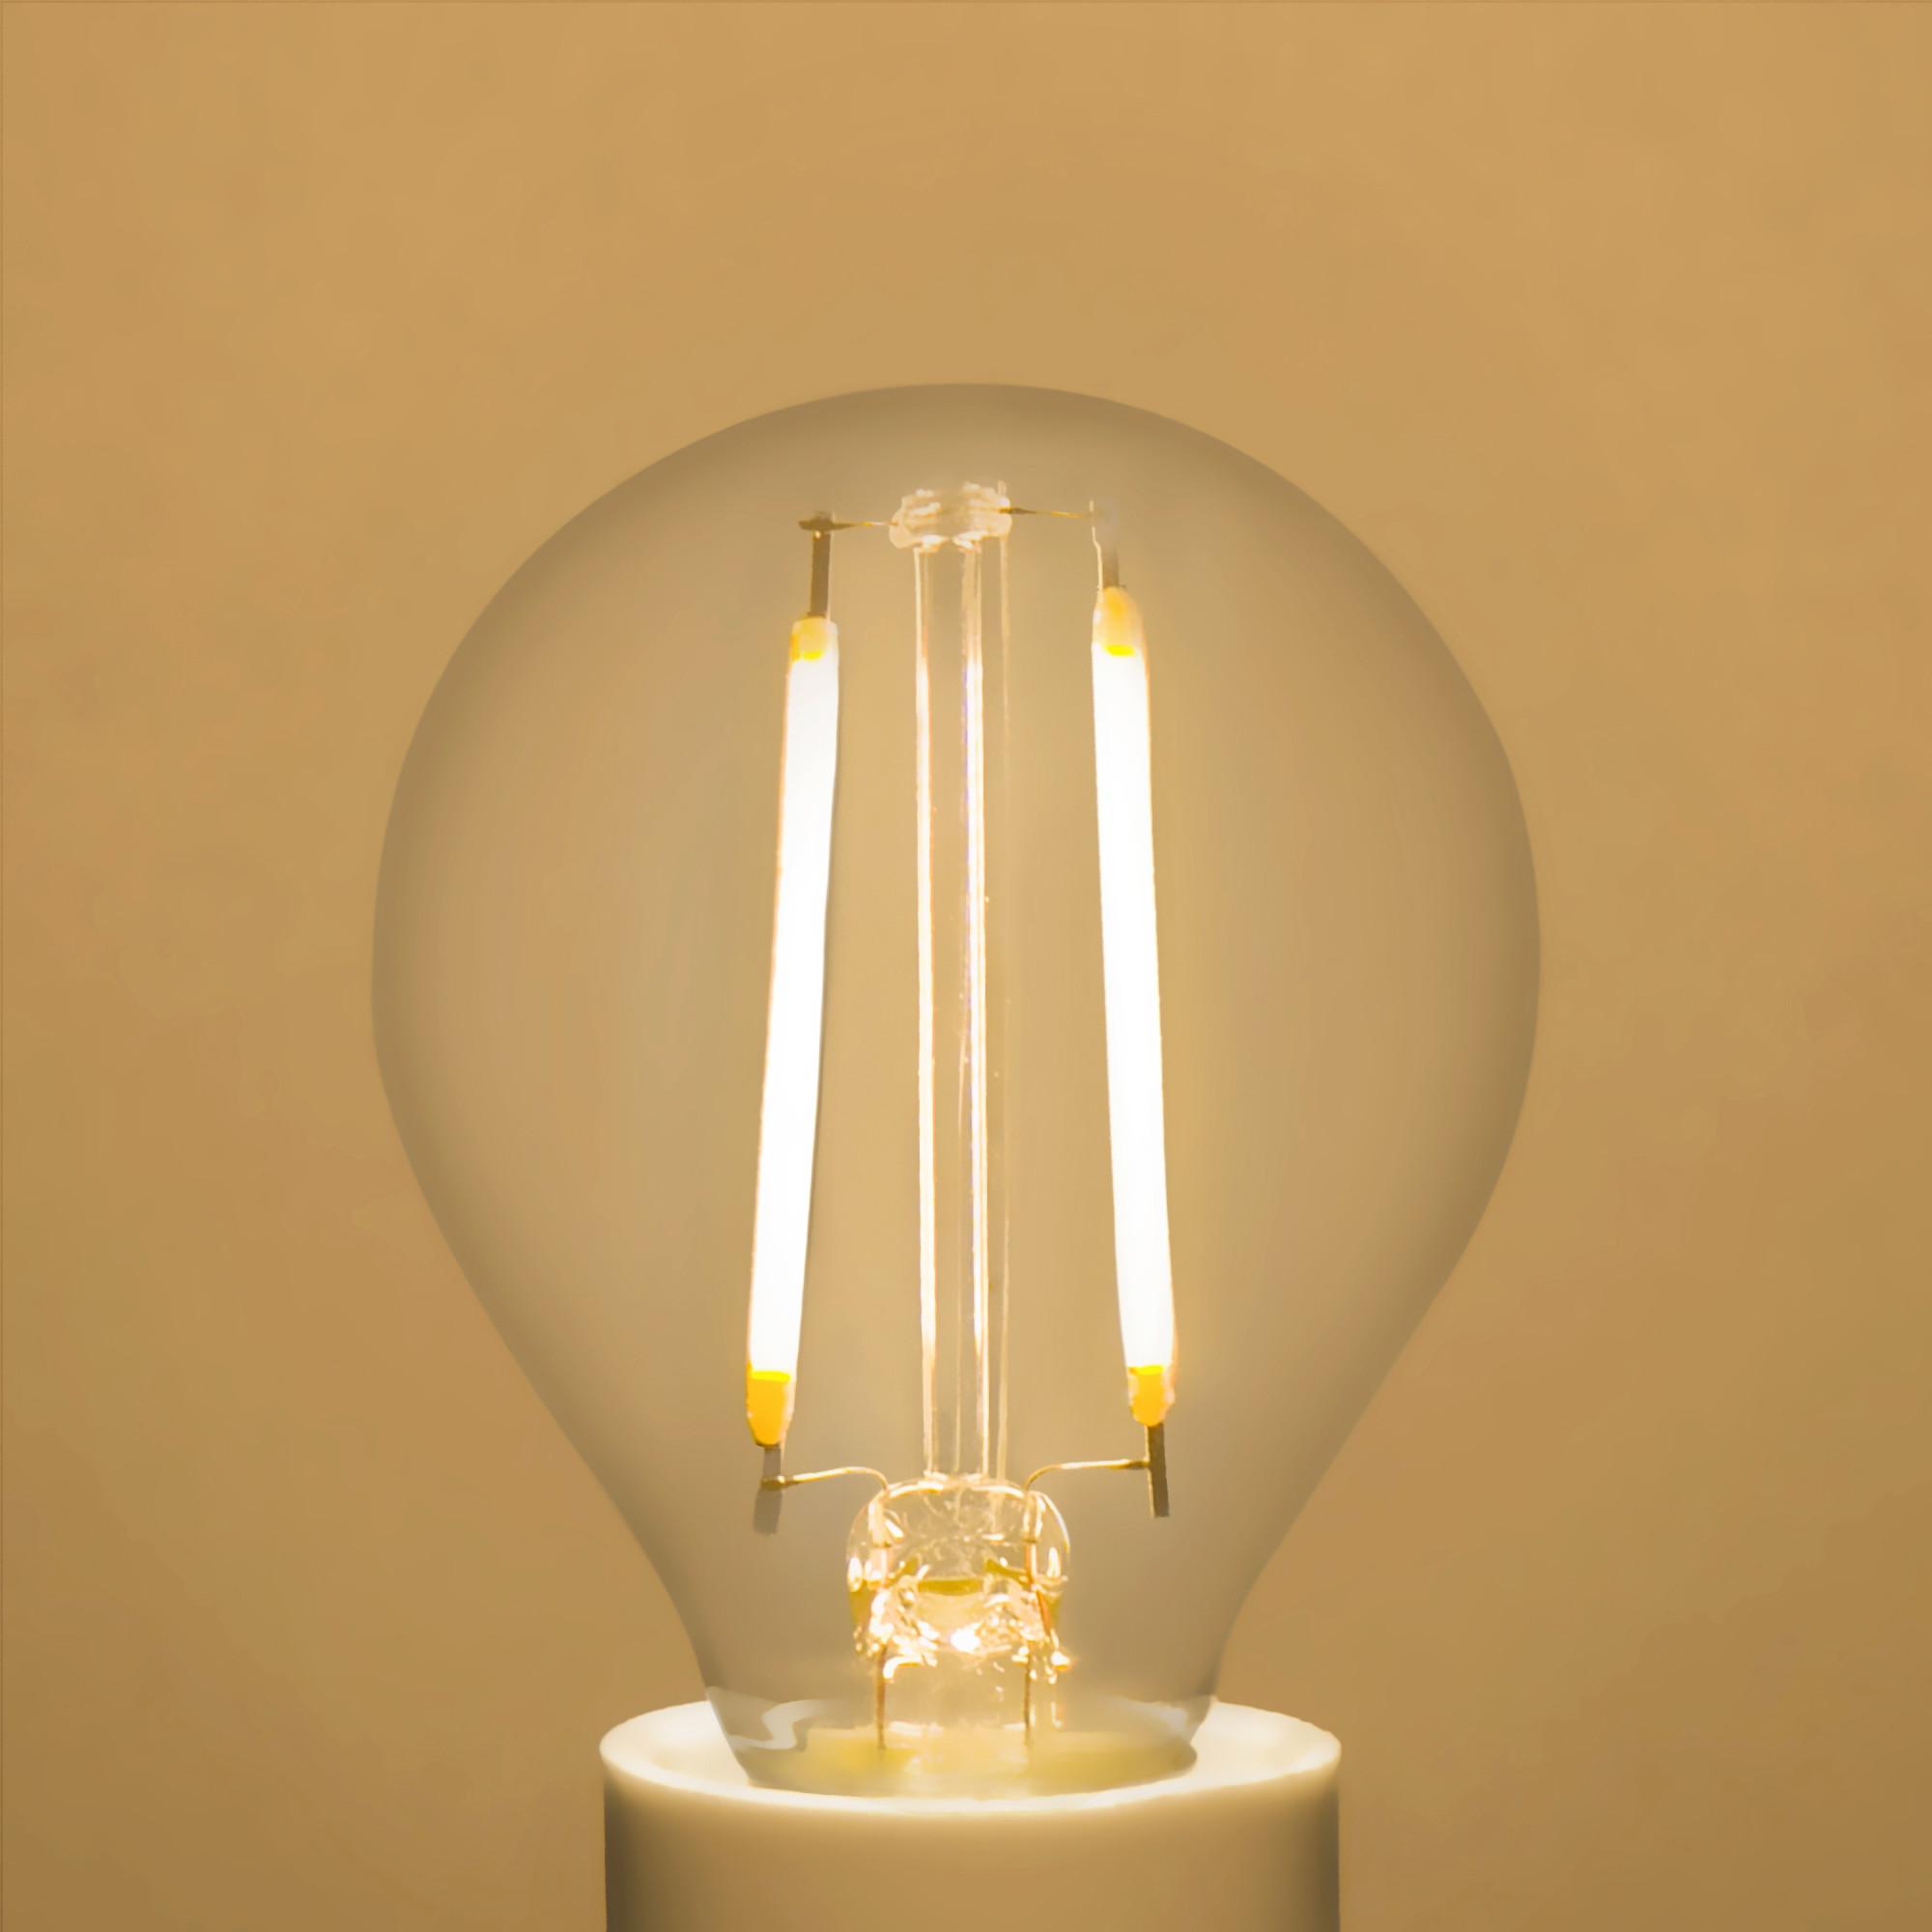 Лампа светодиодная Lexman E14 45 Вт 470 Лм 4000 K теплый белый свет прозрачная колба